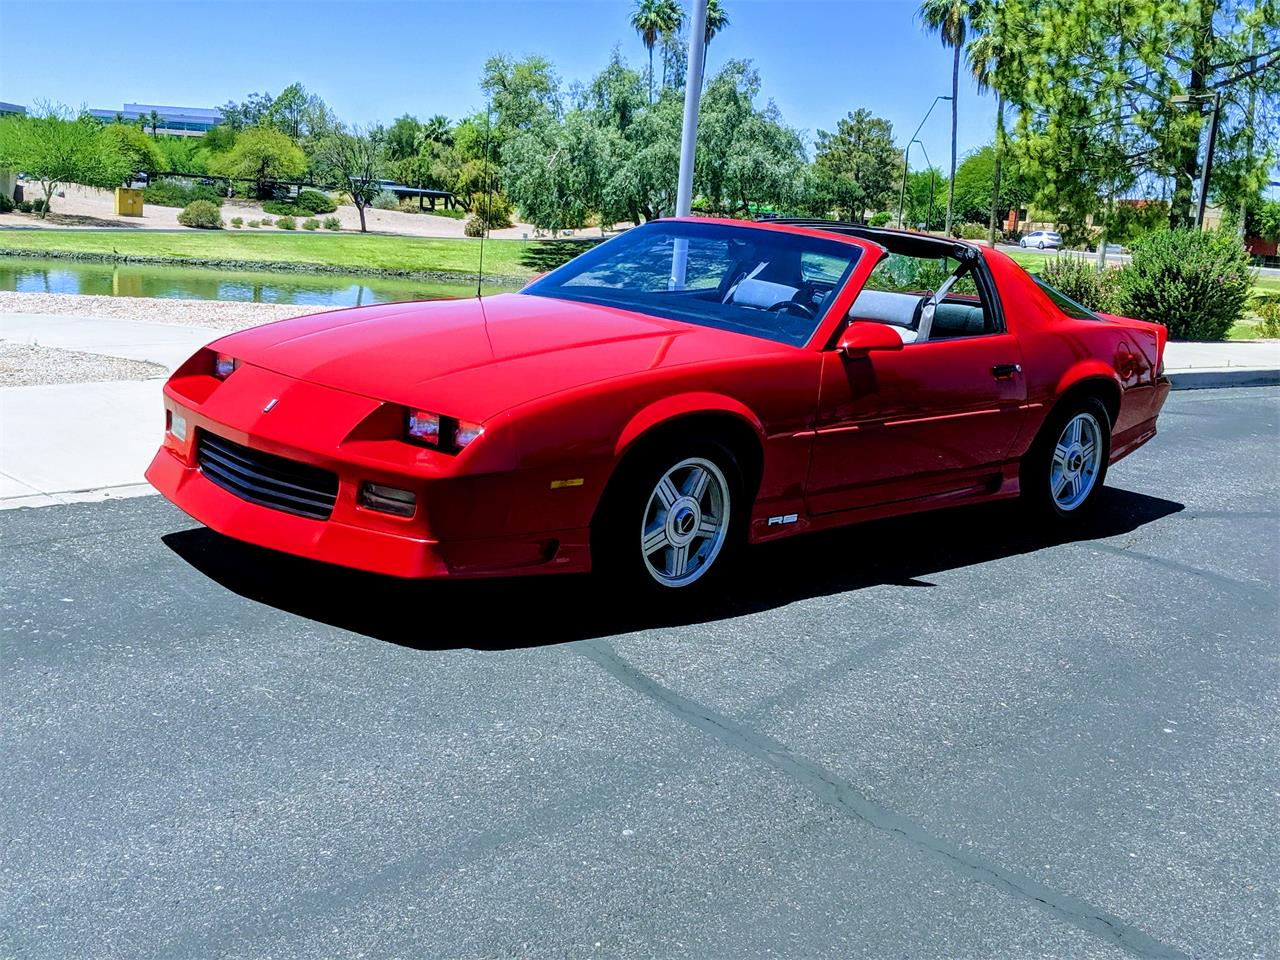 For Sale: 1992 Chevrolet Camaro RS in Chandler, Arizona